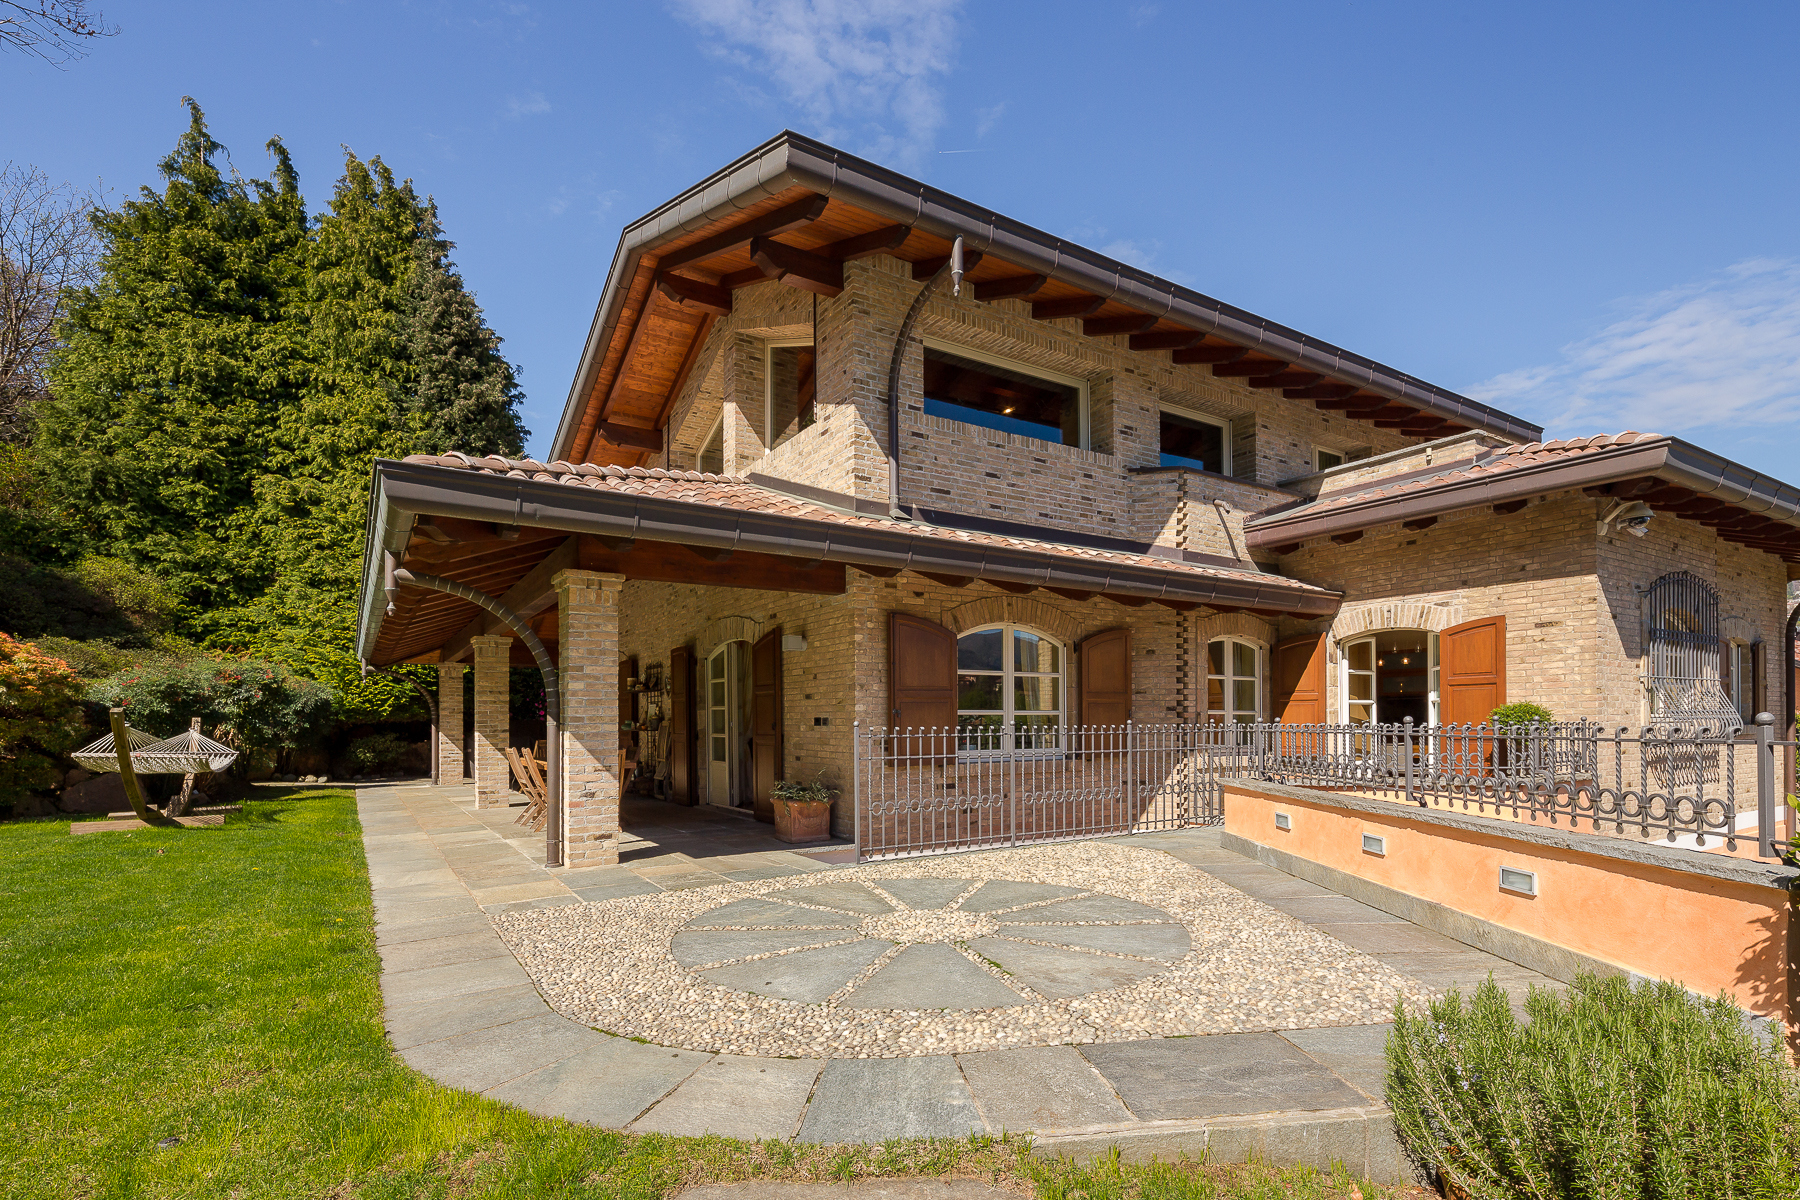 Villa in Vendita a Varese: 5 locali, 470 mq - Foto 6